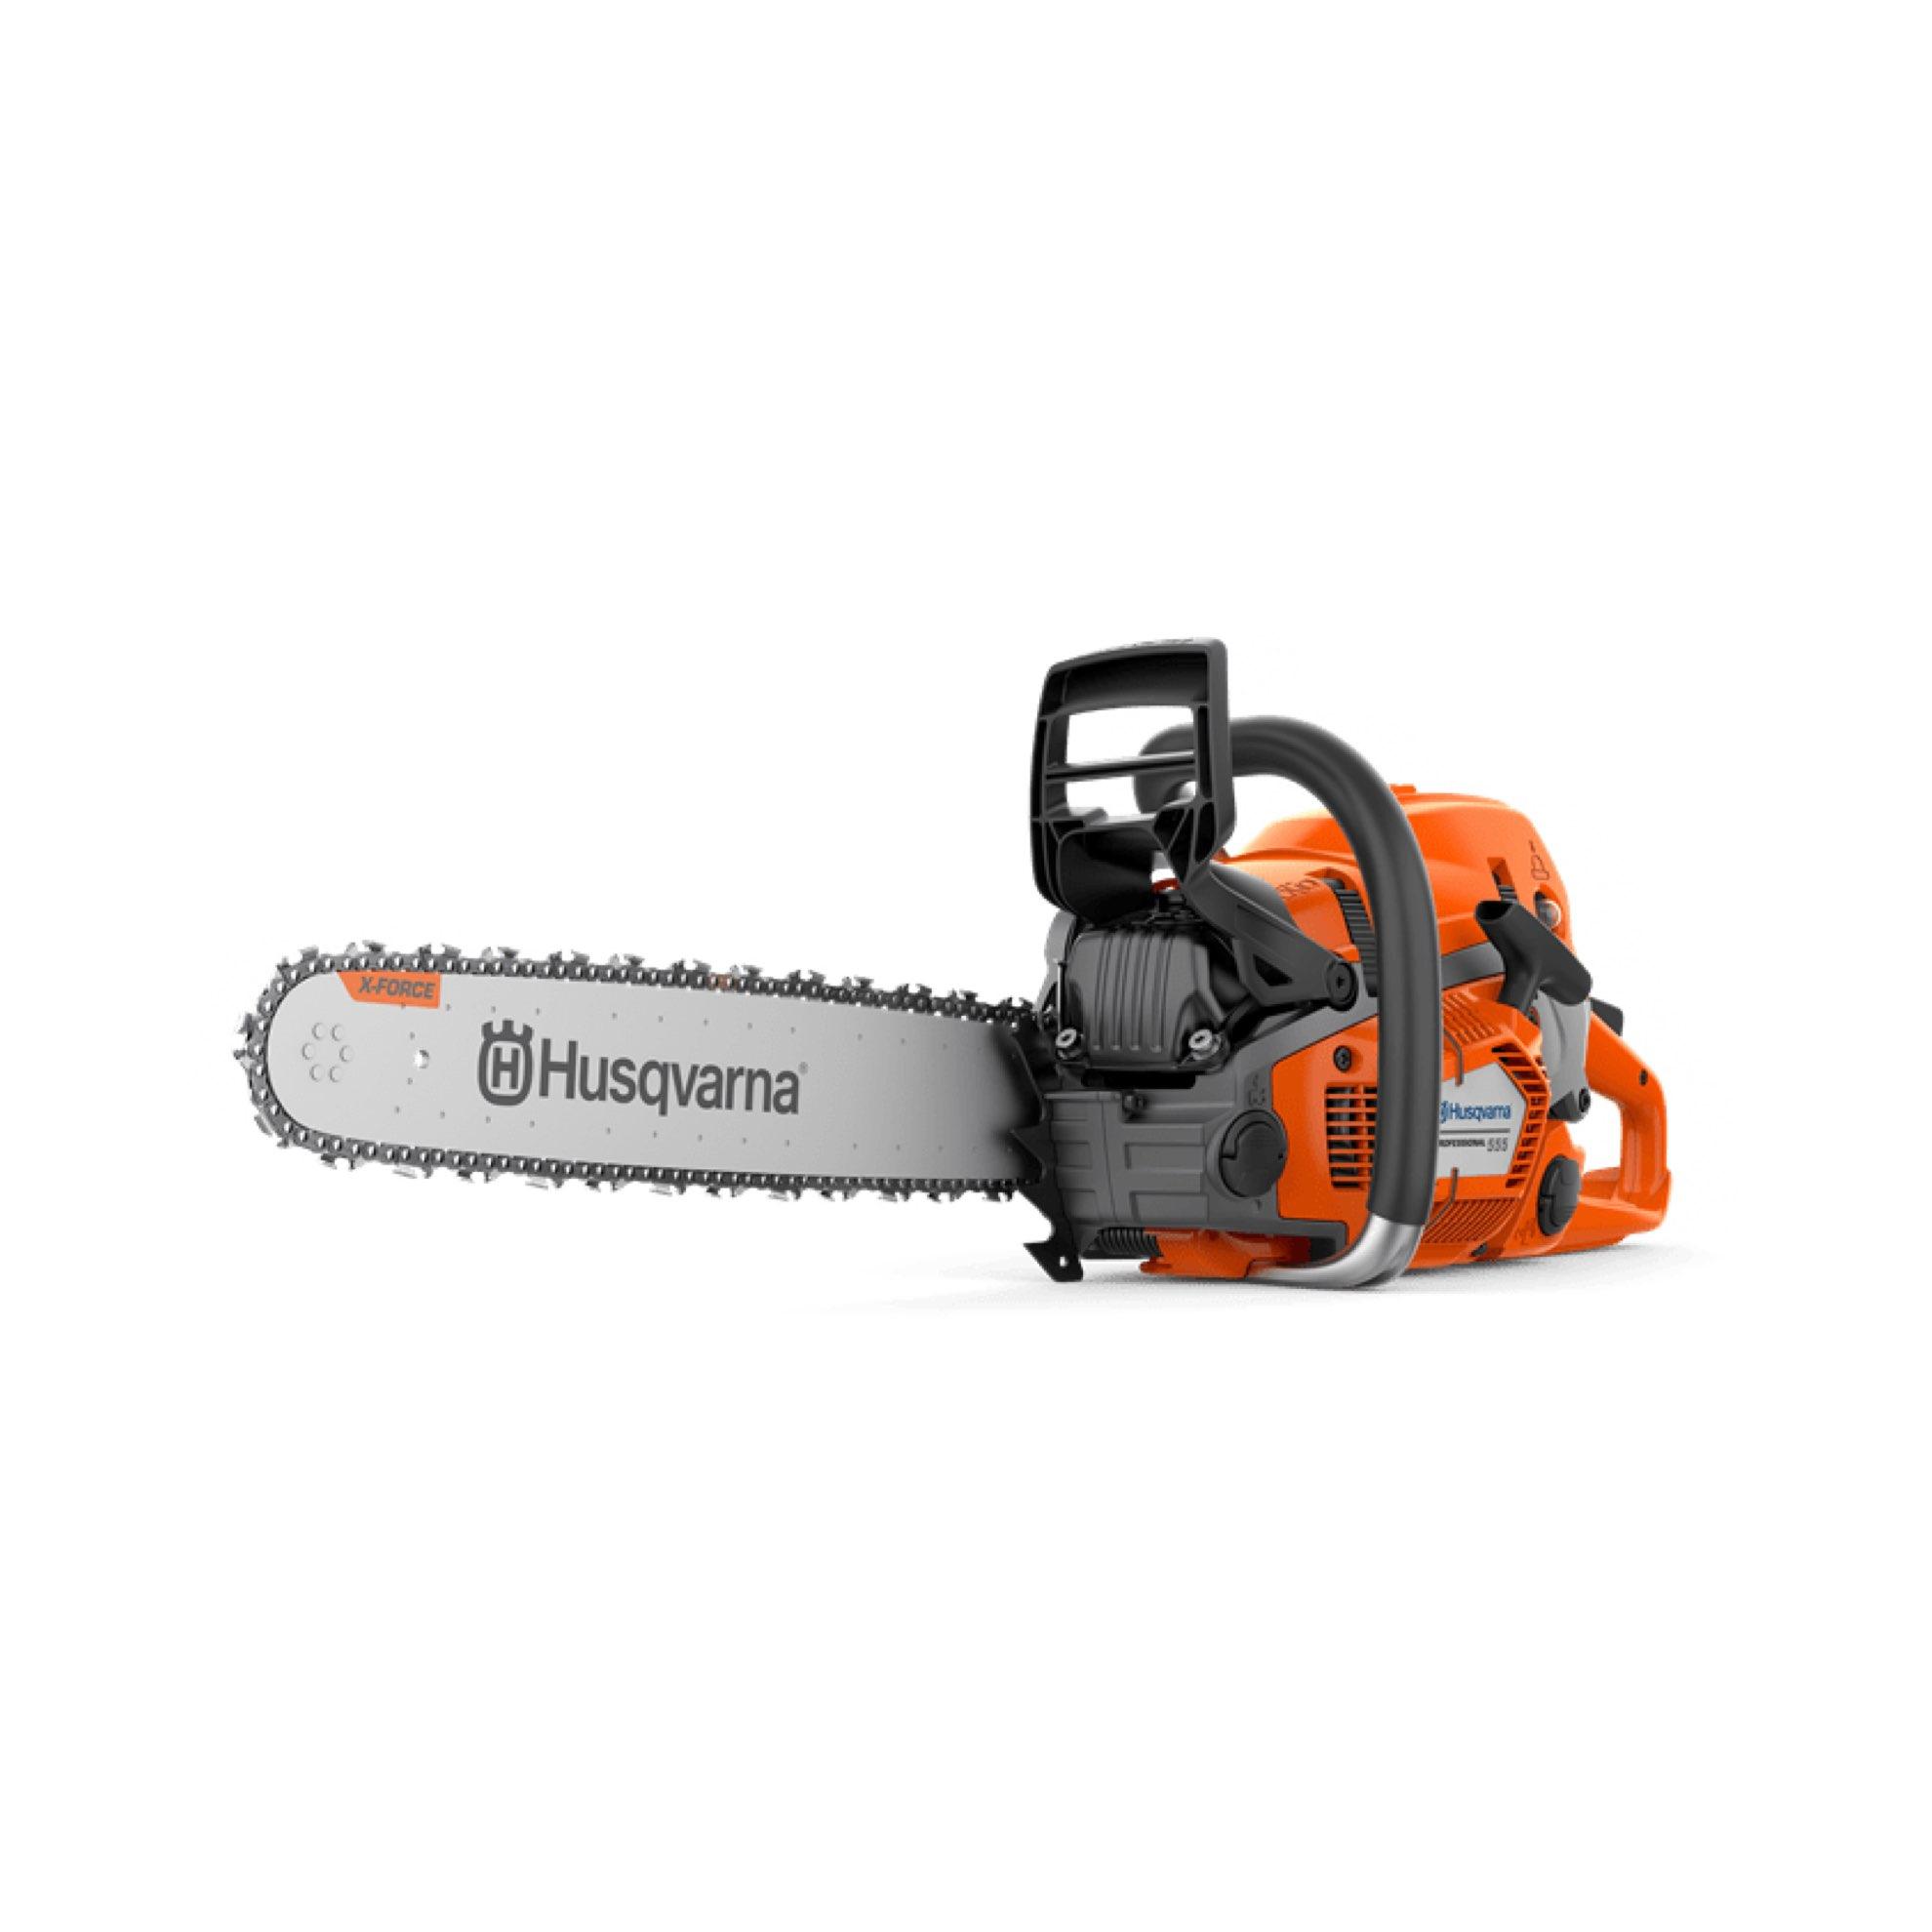 Husqvarna 555 Petrol-powered Chainsaw